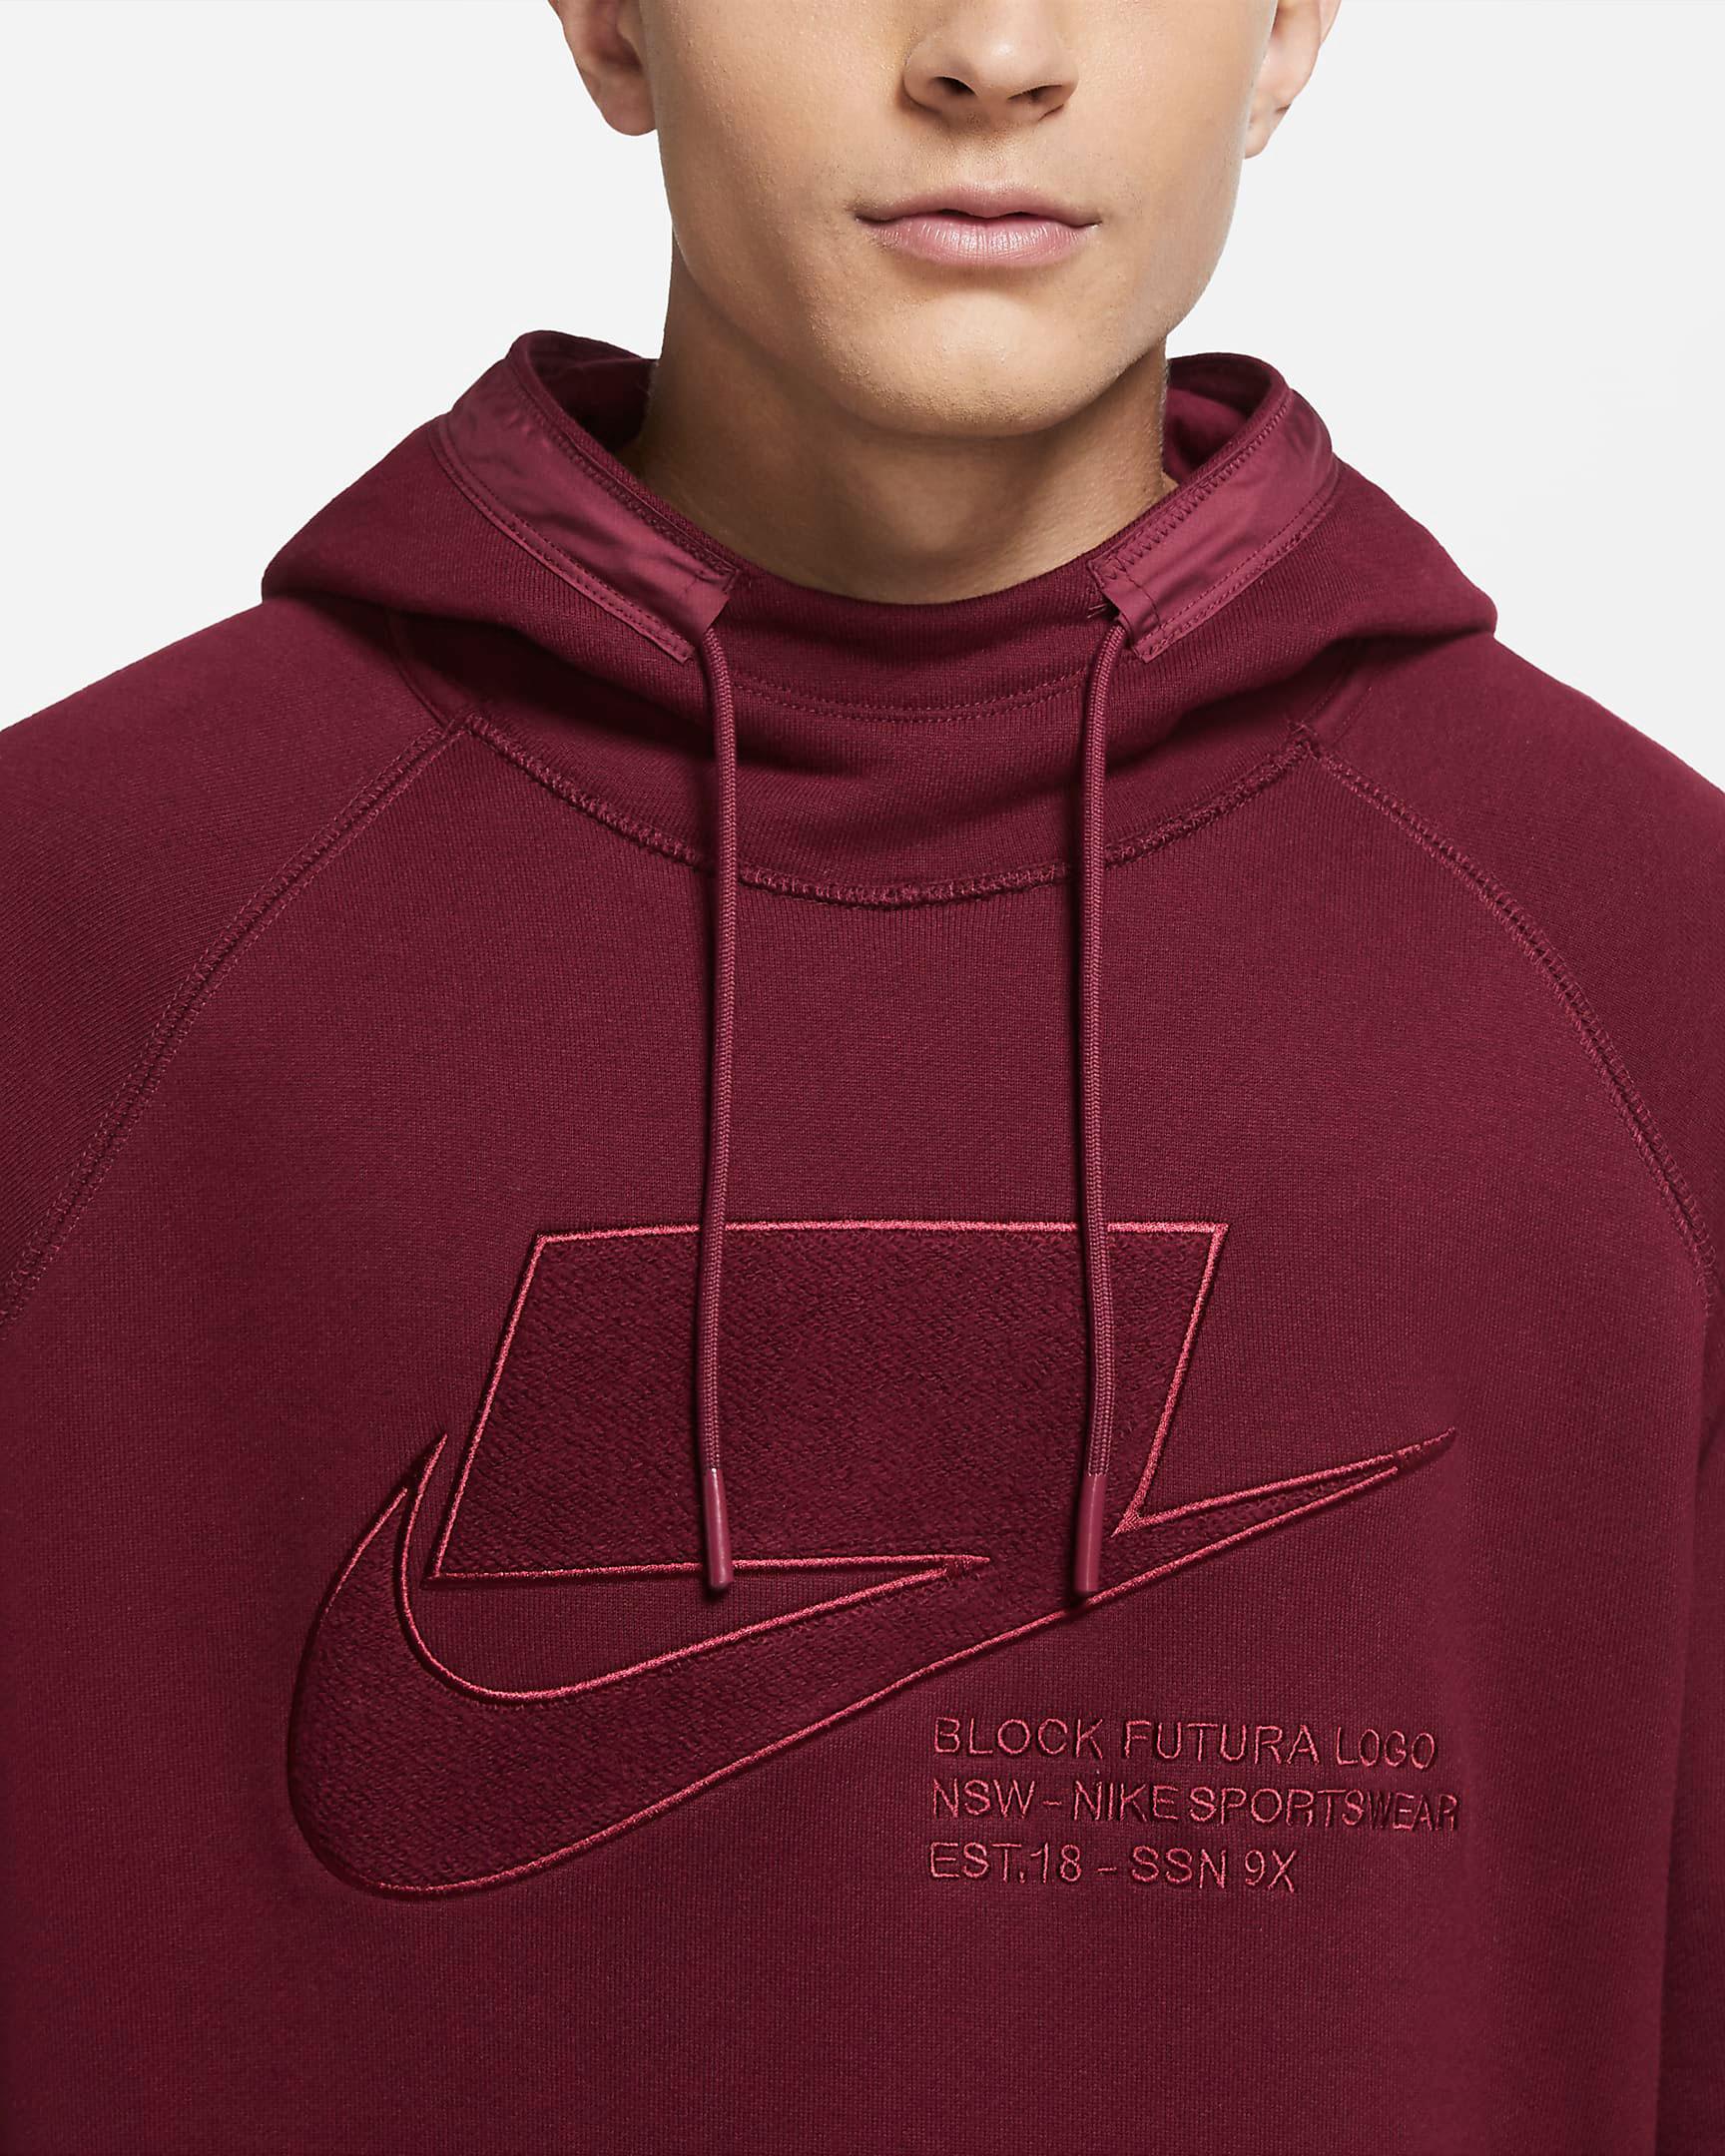 nike-sportswear-hoodie-beetroot-bordeaux-1